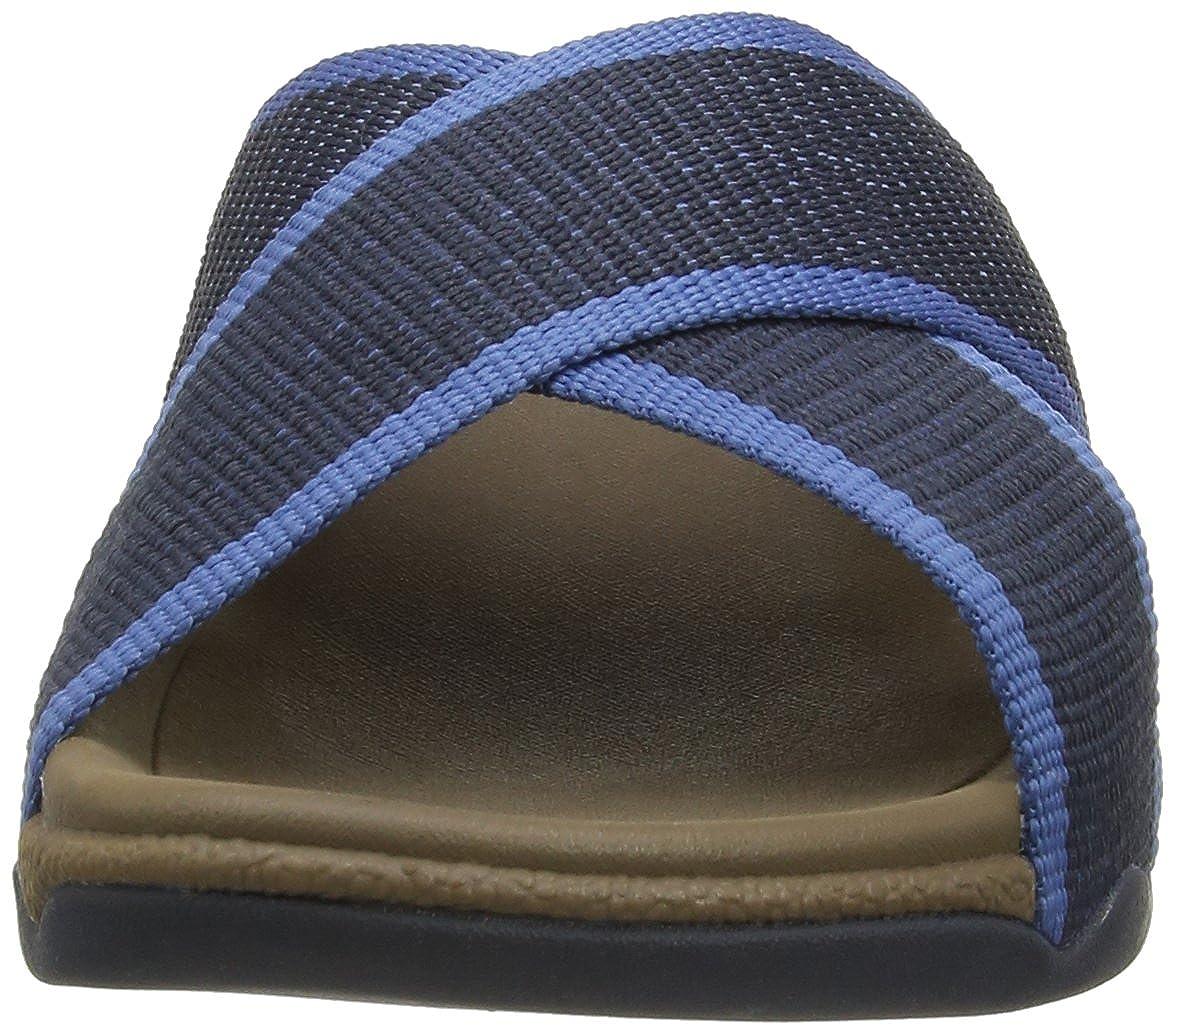 FitFlop Herren Surfer Slide, Herren FitFlop Sandalen Blau (Super Navy) b743ad